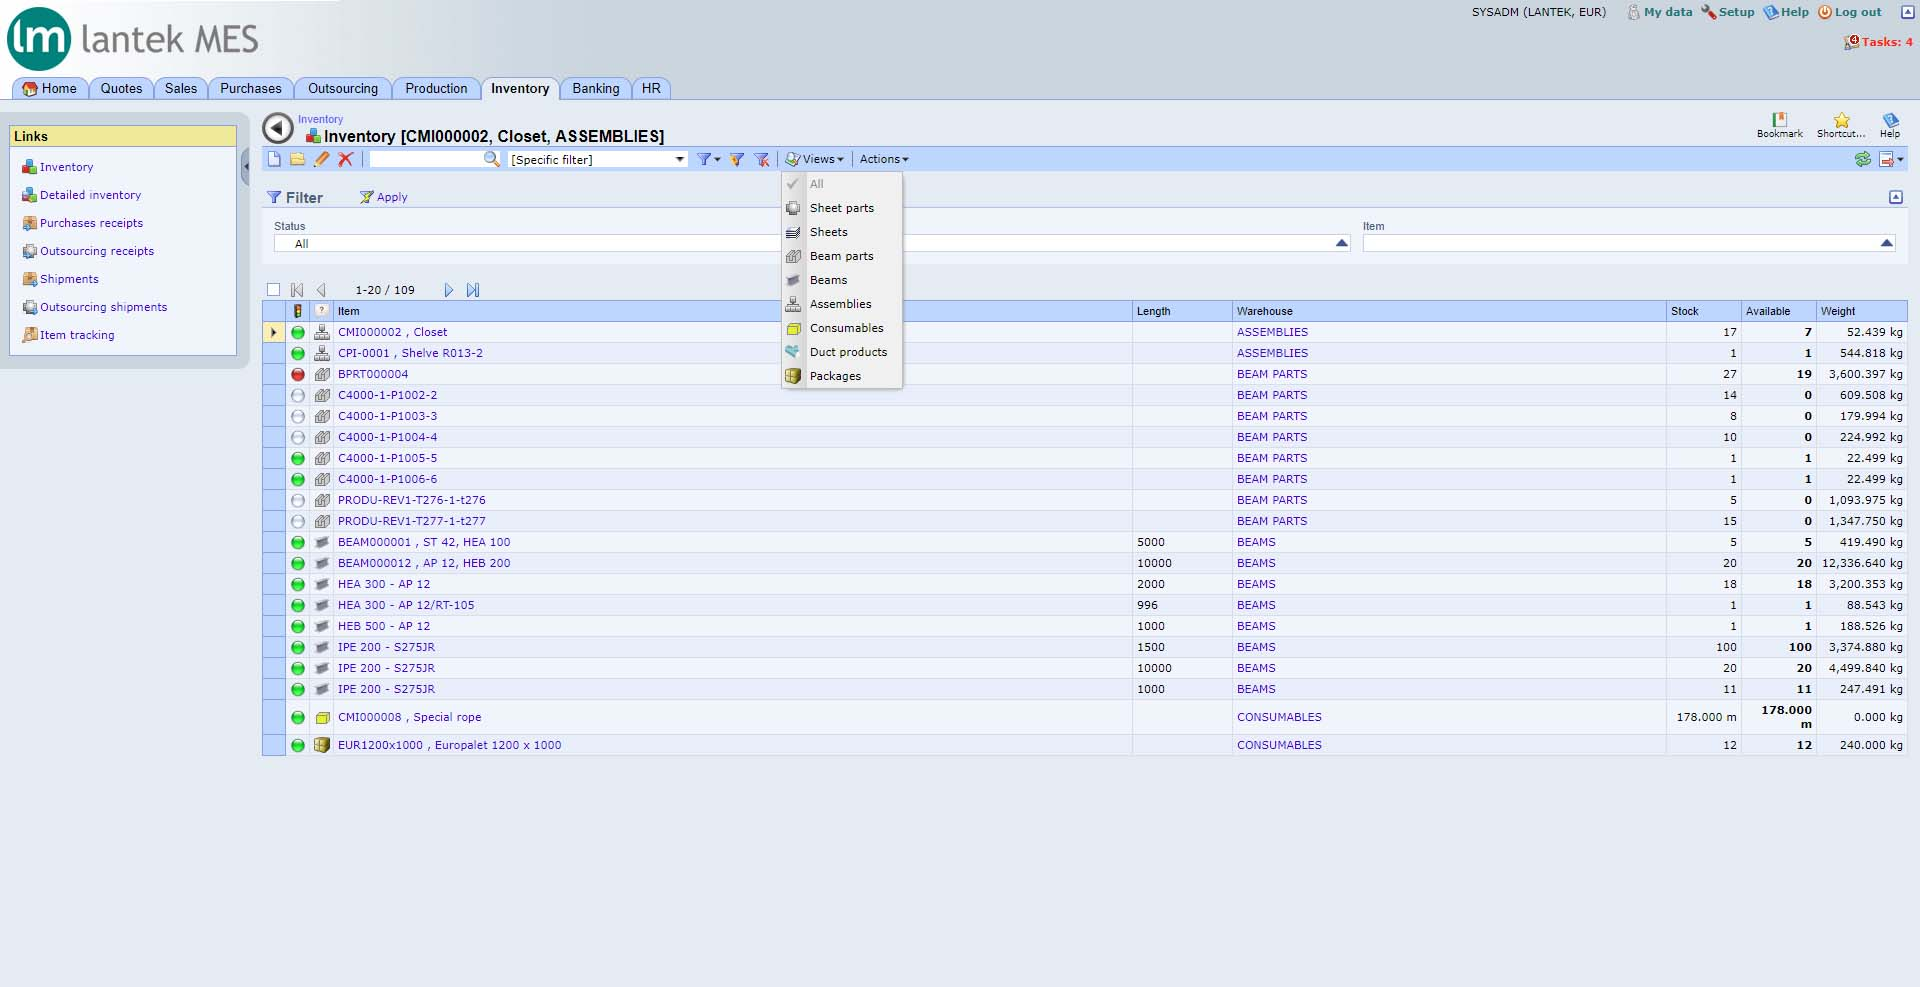 Lantek Integra Inventory  - Sheet inventory